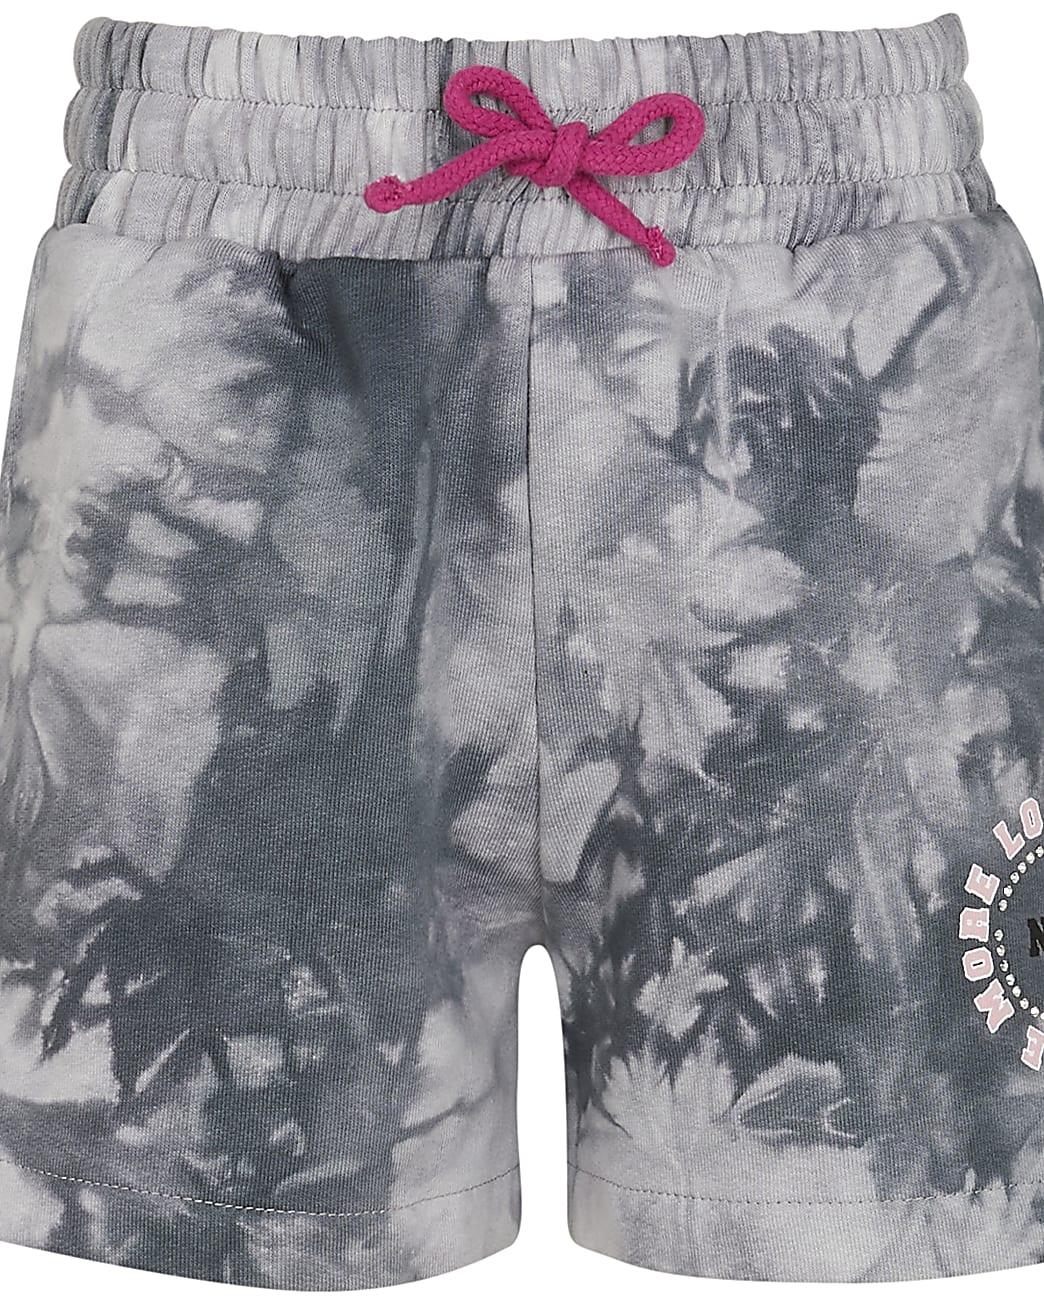 Age 13+ girls grey tie dye boyfriend shorts